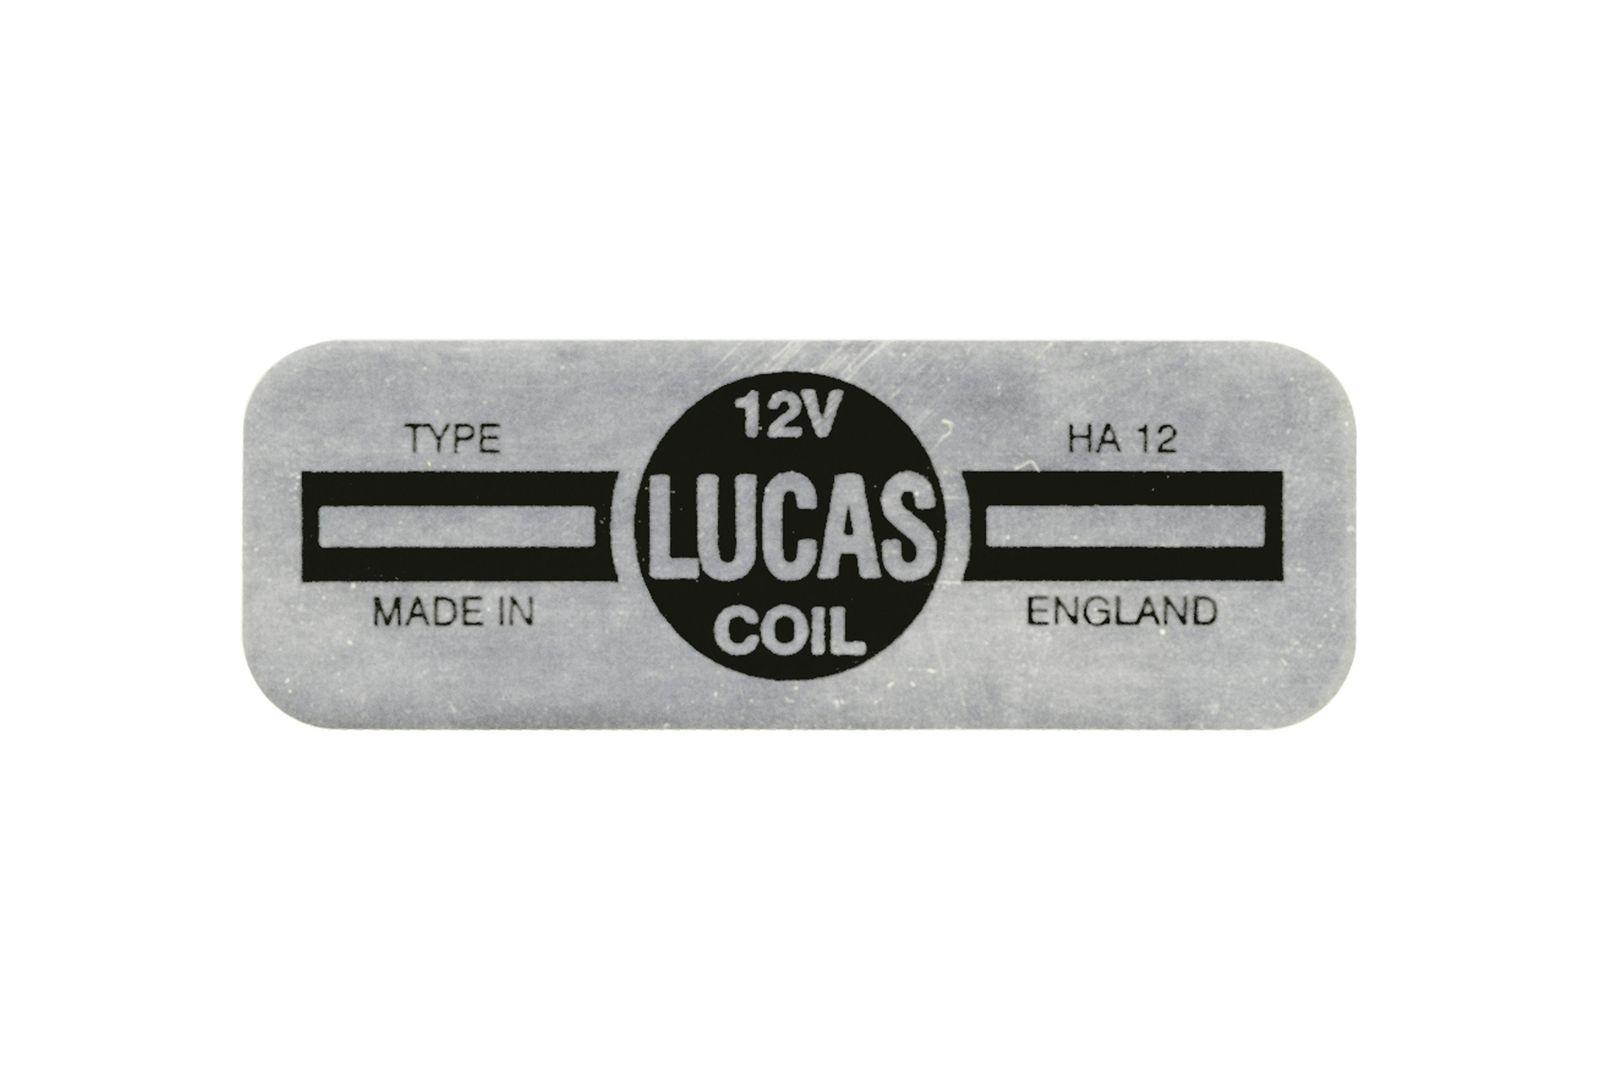 "#Aufkleber ""Lucas"" HA12 Zündspule Mini, CRST156"